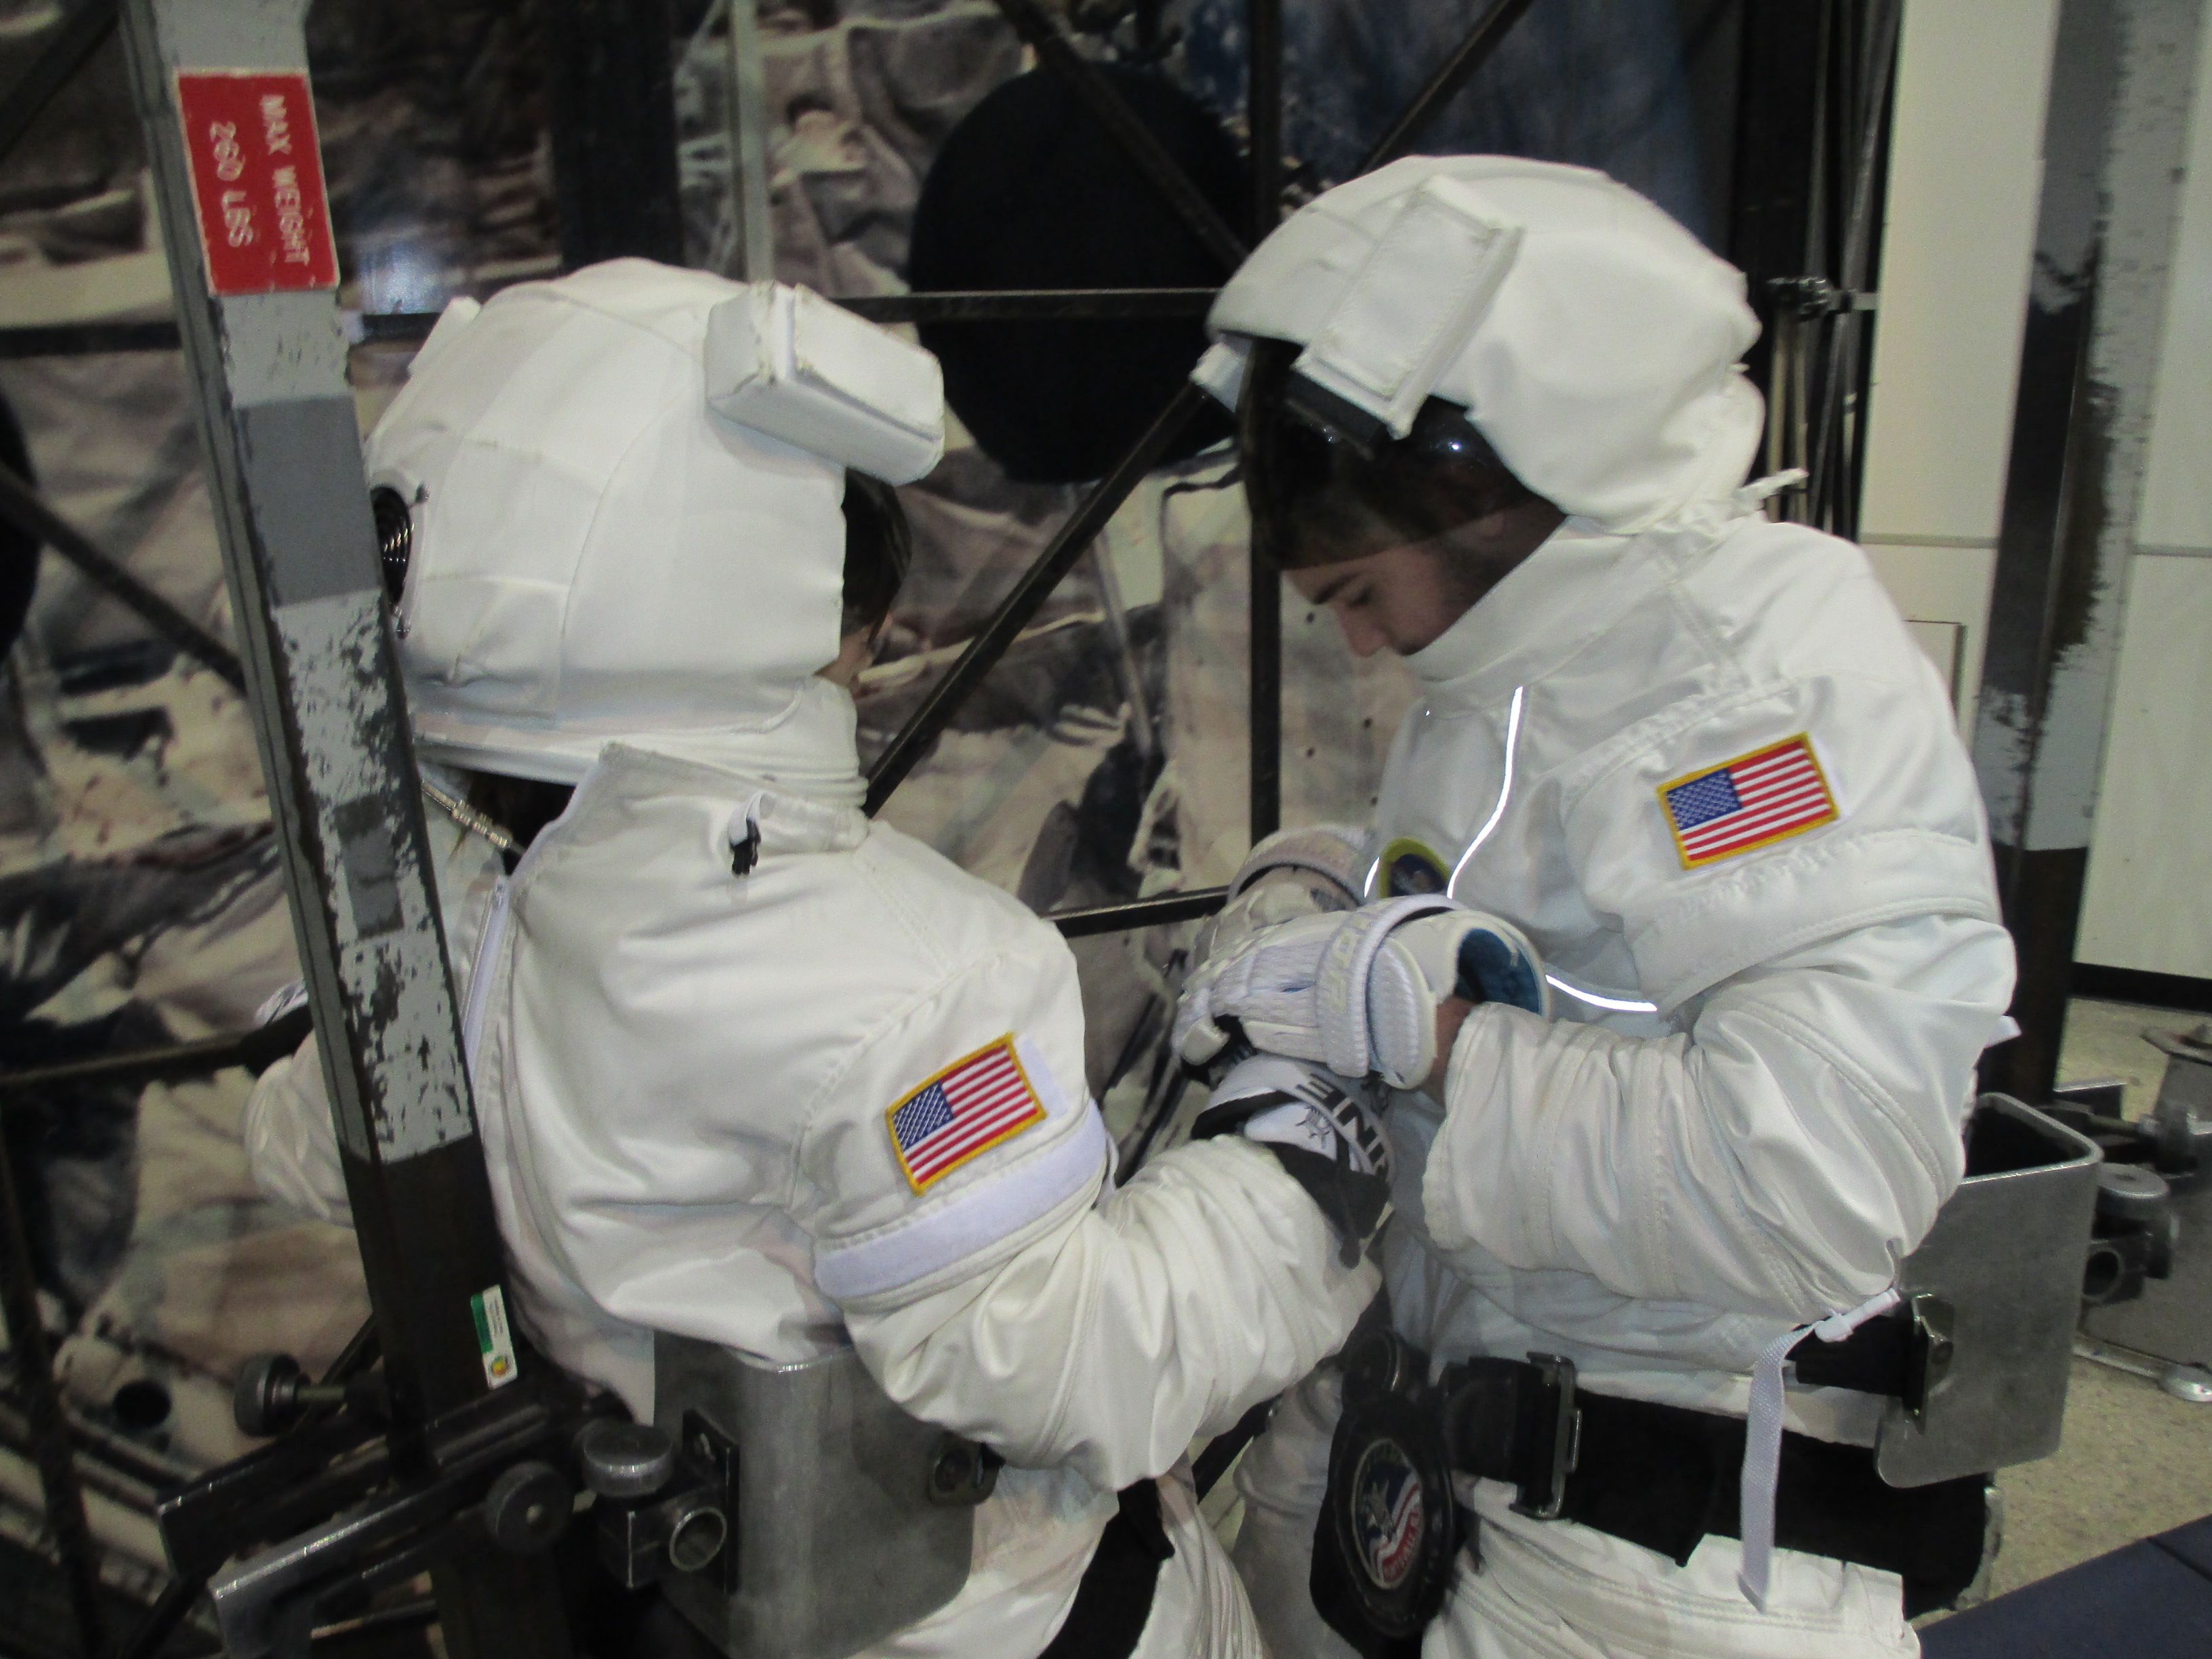 Spacewalk preparation teamwork from Advanced Space Academy ...